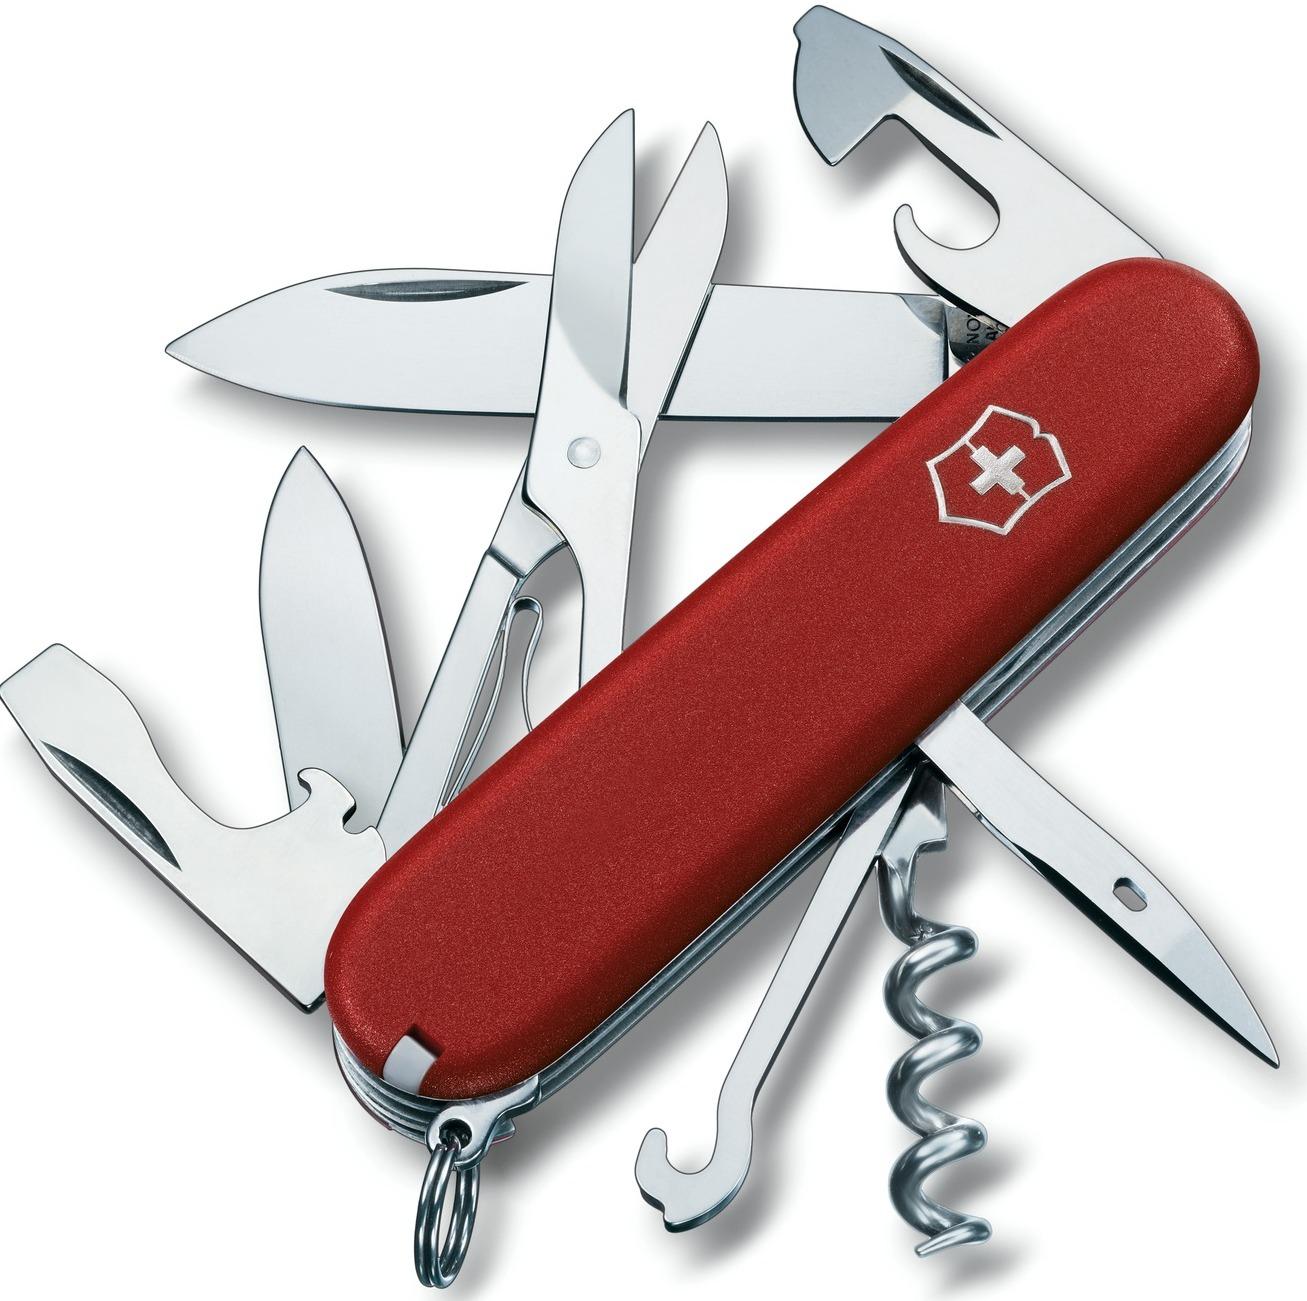 EcoLineМультитулы<br>Нож перочинный<br>